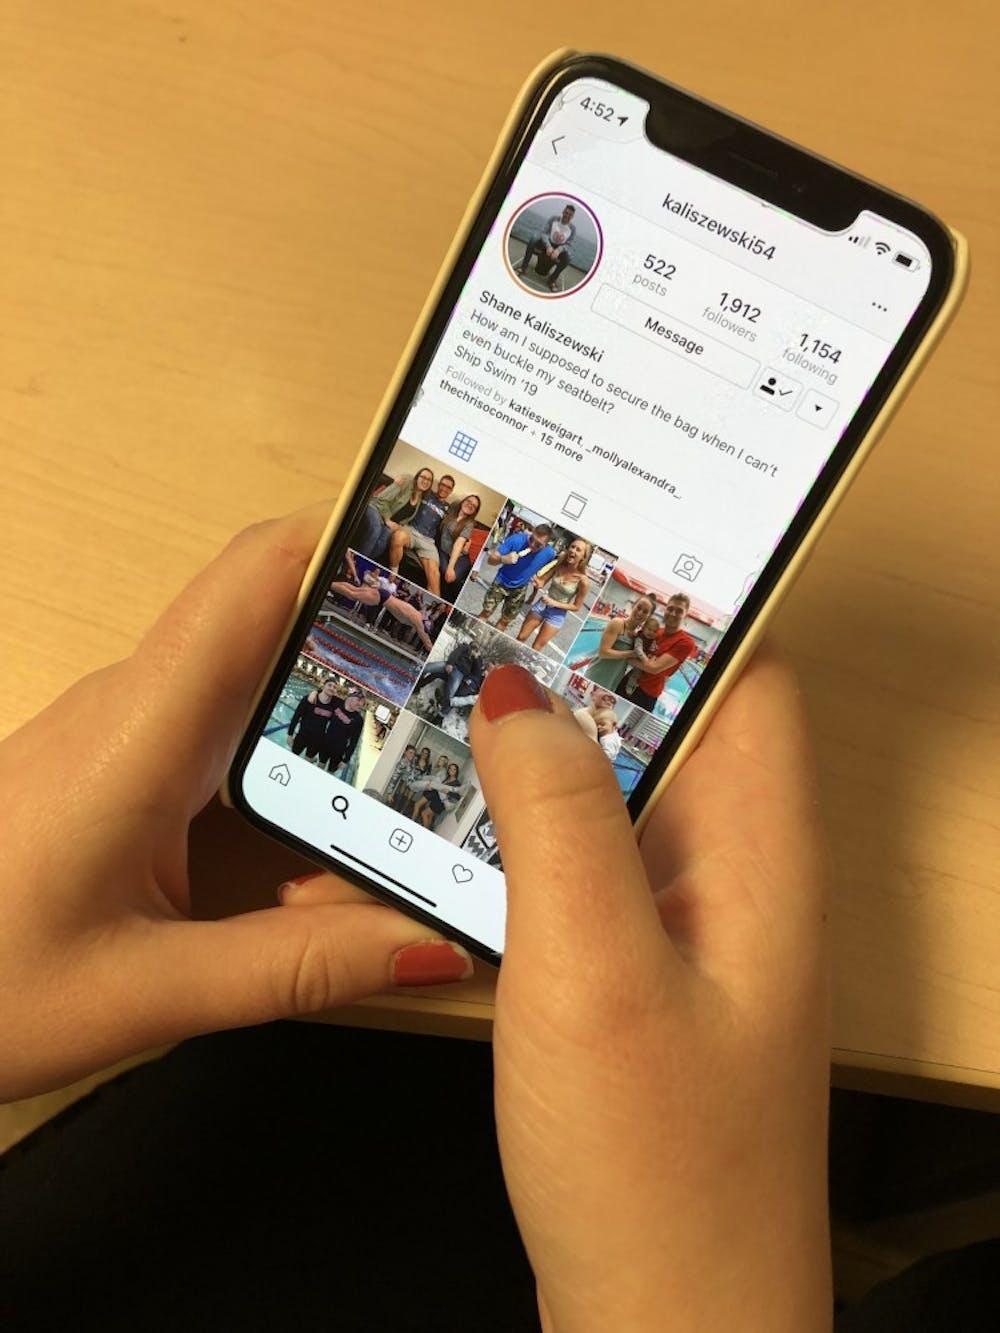 Instagram, social media influencers perpetuate false perceptions of reality